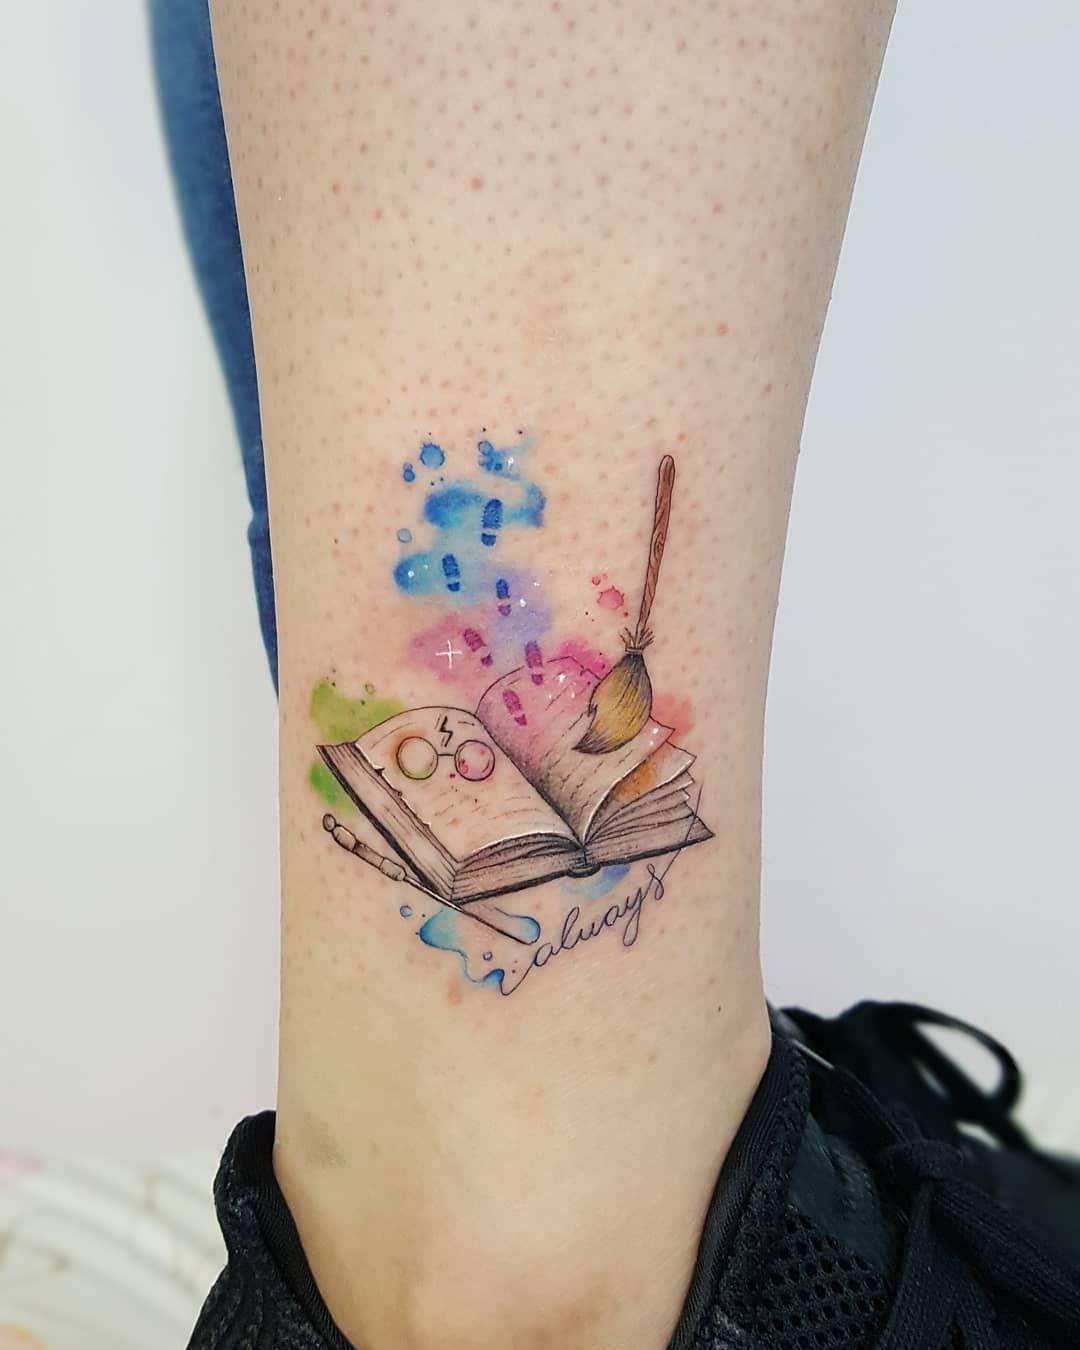 Harry Potter Tattoos Design Inspiration for Fans - Inside Out